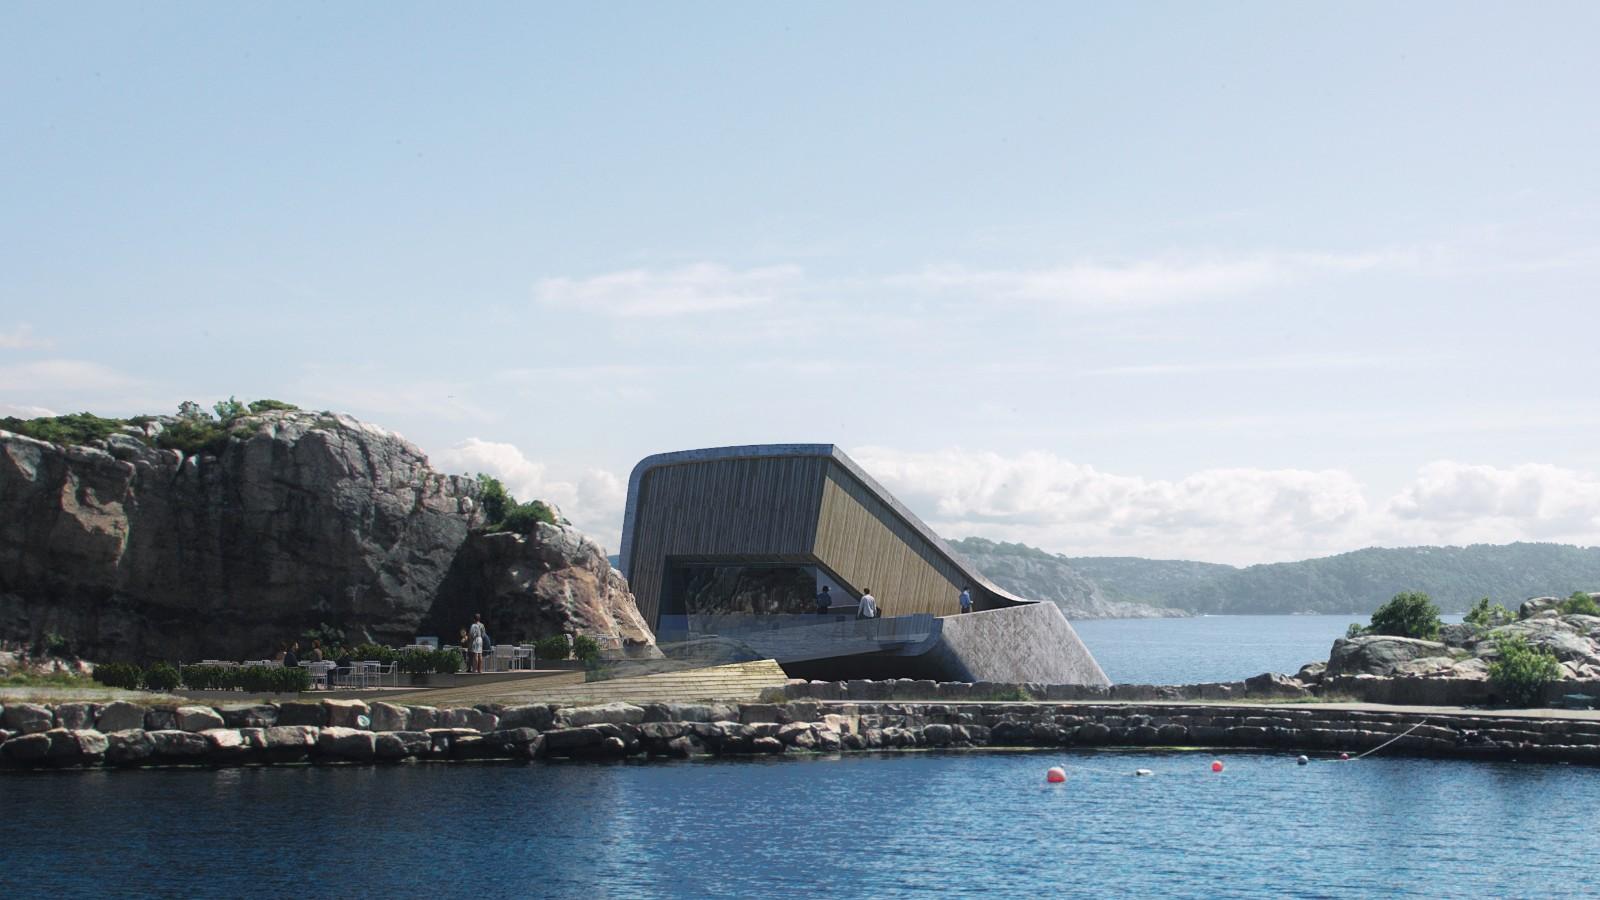 underwater restaurant Norwegian Architecture Firm Reveals Project for First Underwater Restaurant 1 Norwegian Architecture Firm Reveals Project for First Underwater Restaurant